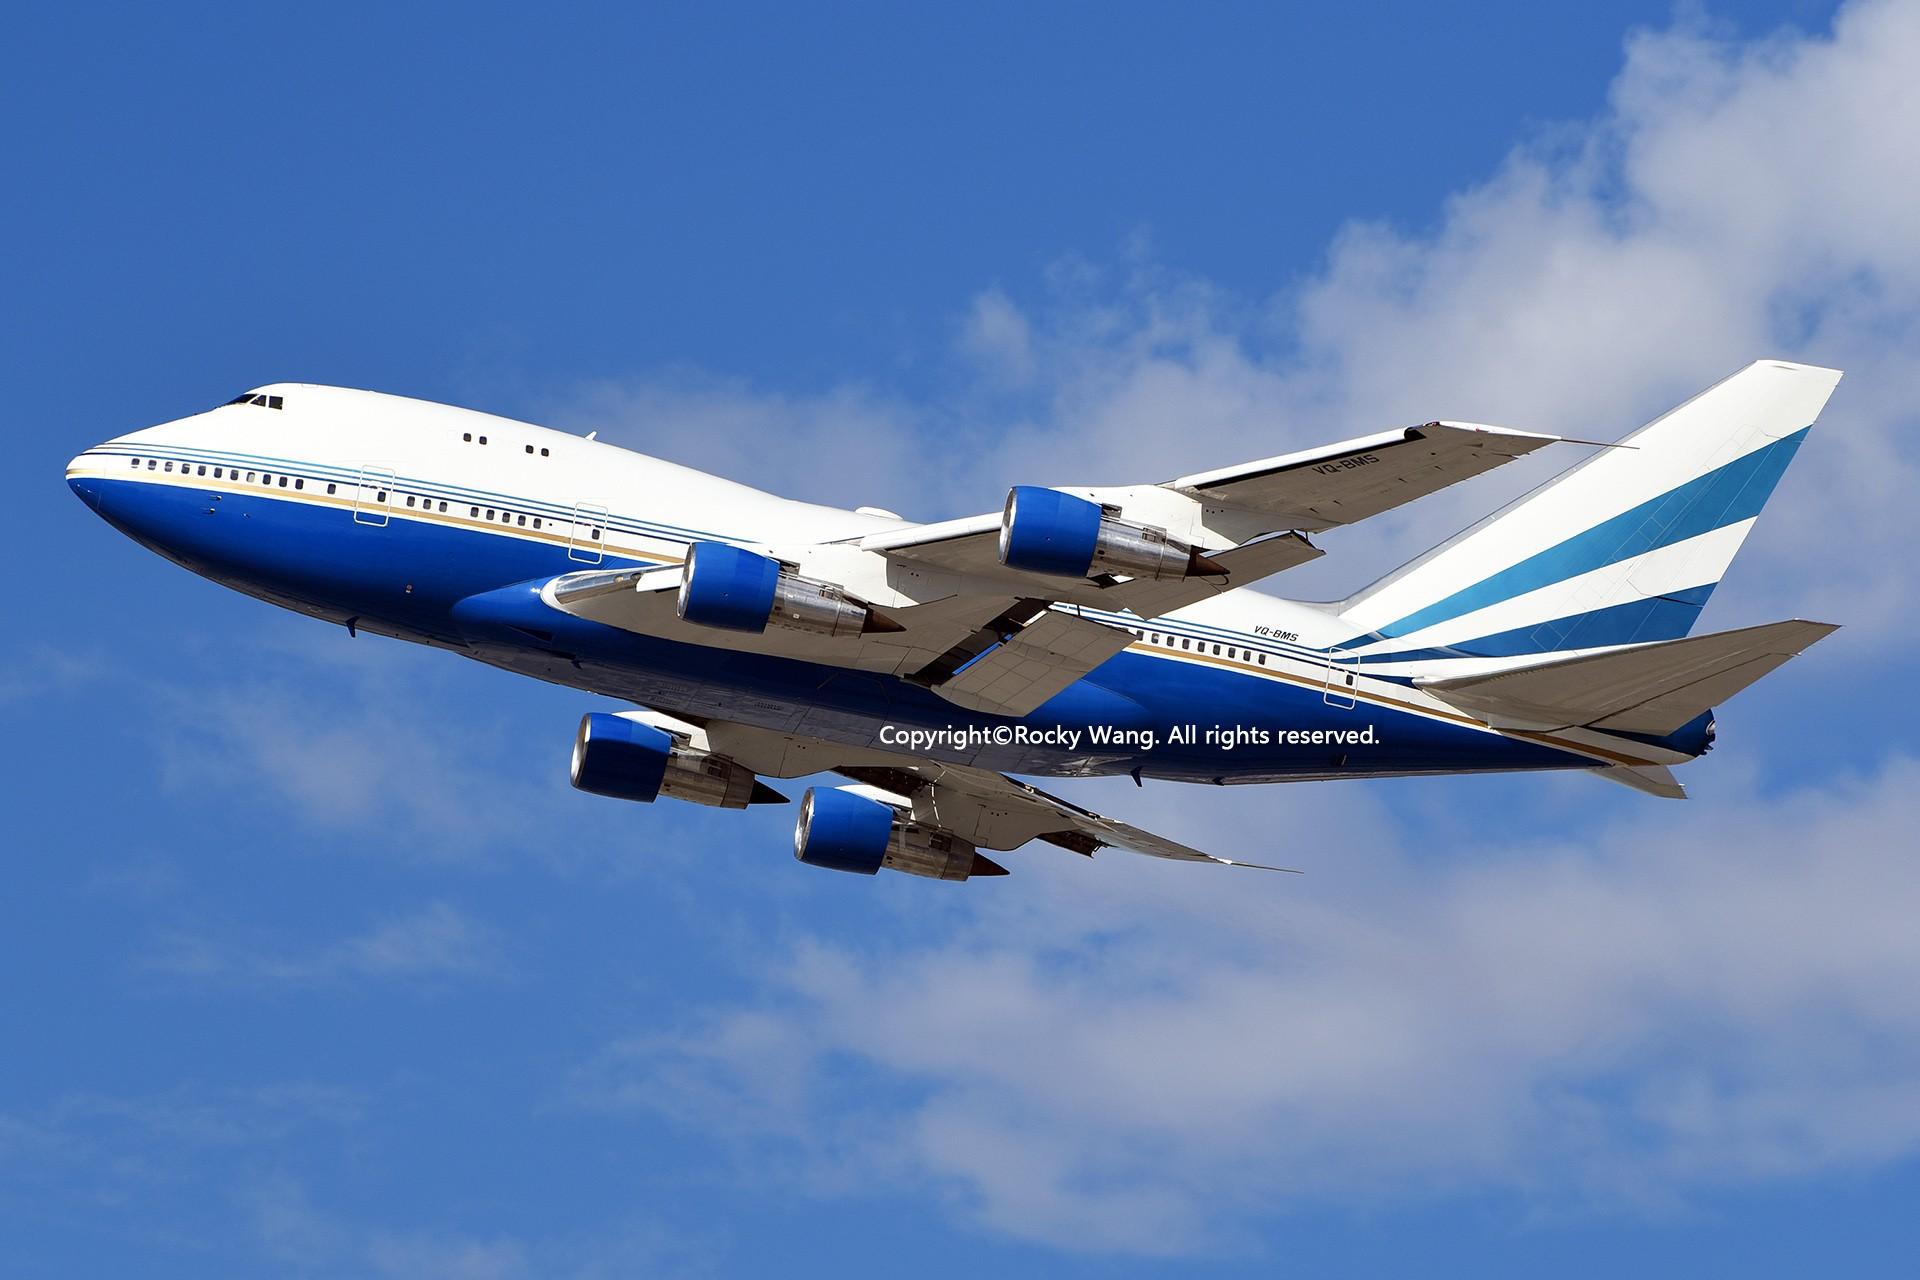 Re:[原创]彩绘圣地-附加彩蛋 BOEING 747SP-21 VQ-BMS Los Angeles Int'l Airport